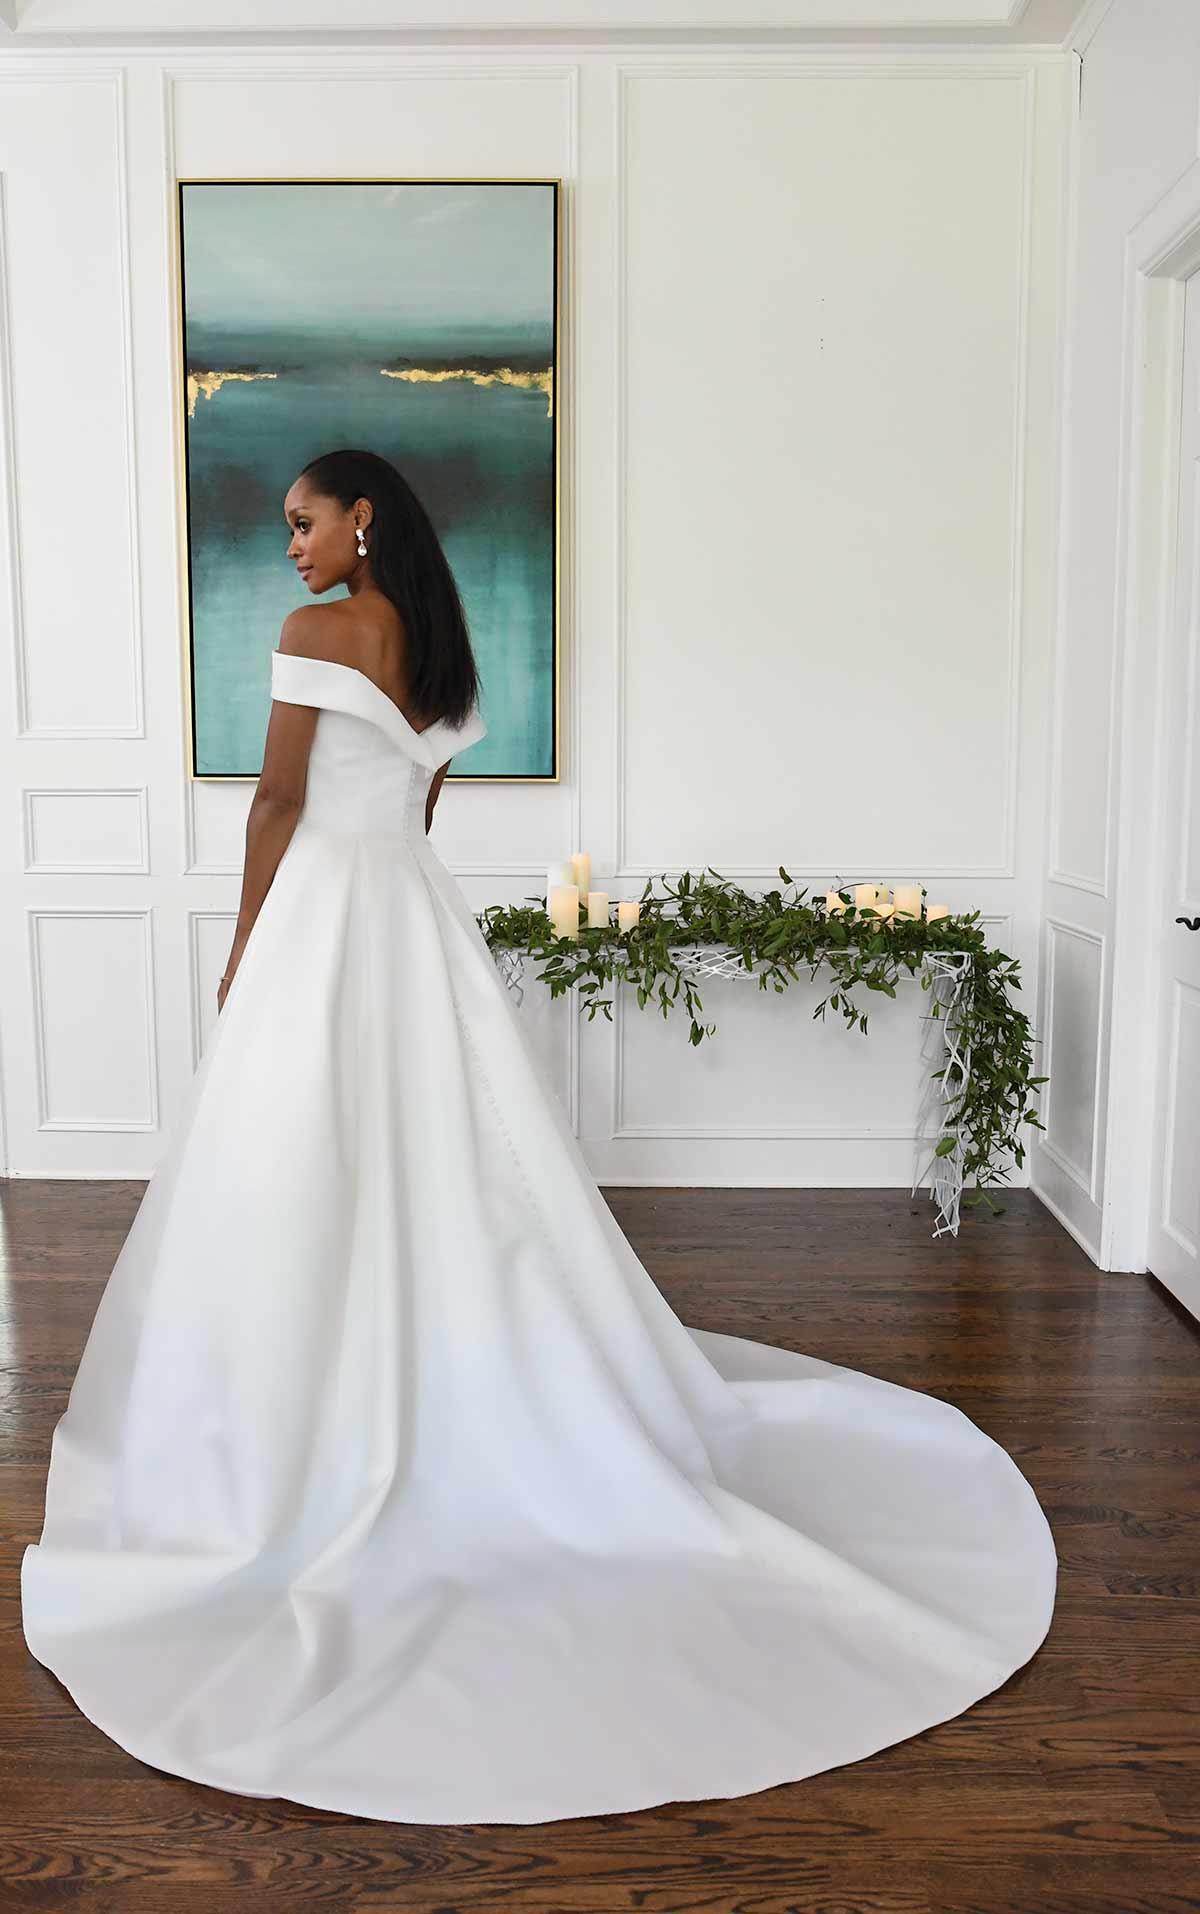 All Who Wander Dresses at Shropshire Country Brides